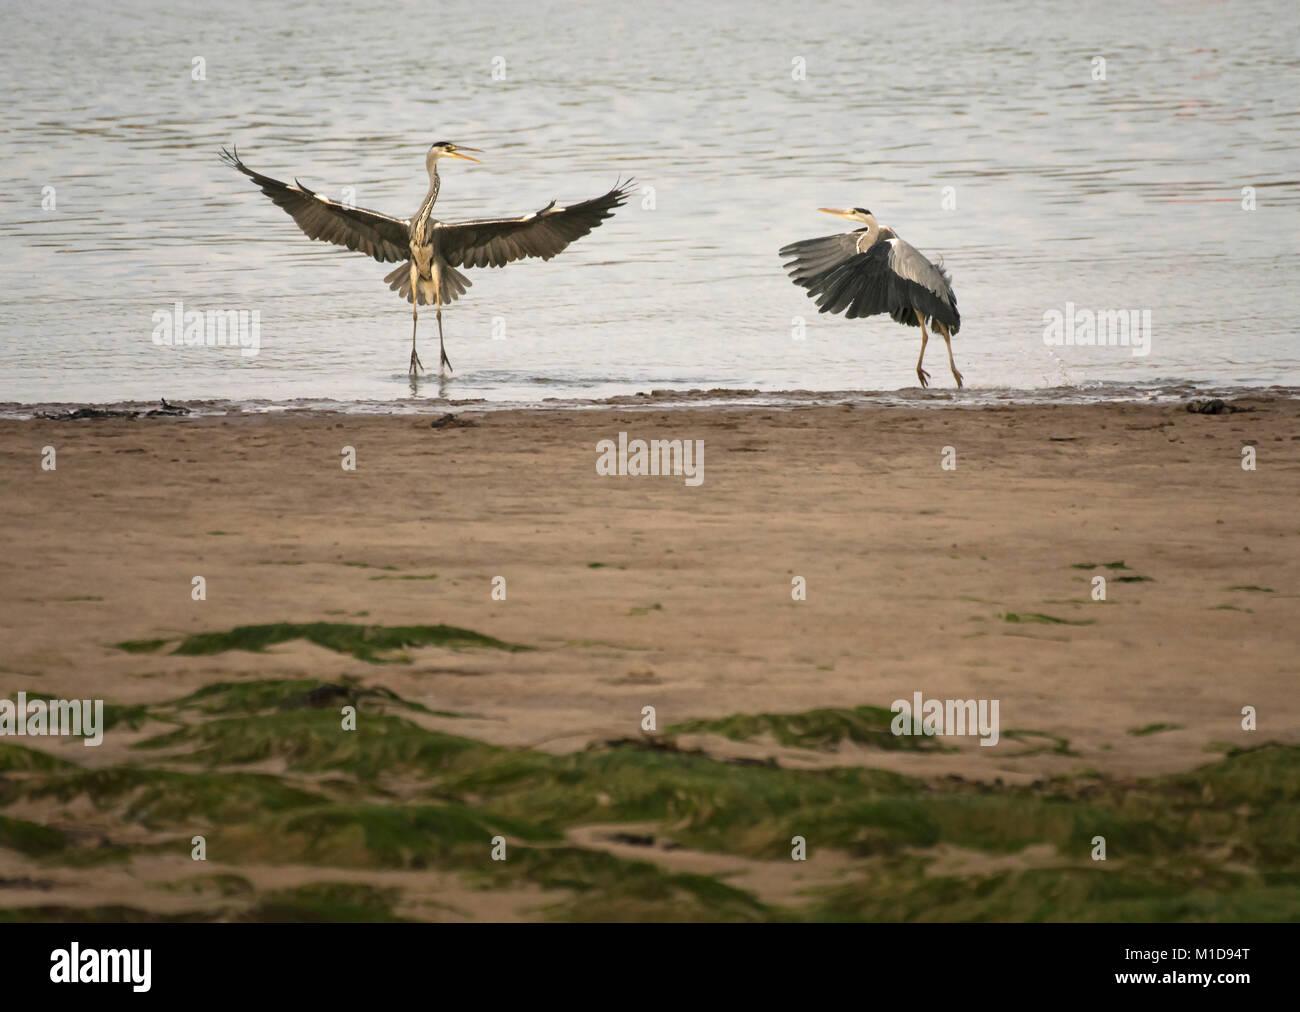 Two Grey herons, Ardea cinerea, squabbling over fishing rights, Wyre estuary, Lancashire, England, United Kingdom - Stock Image